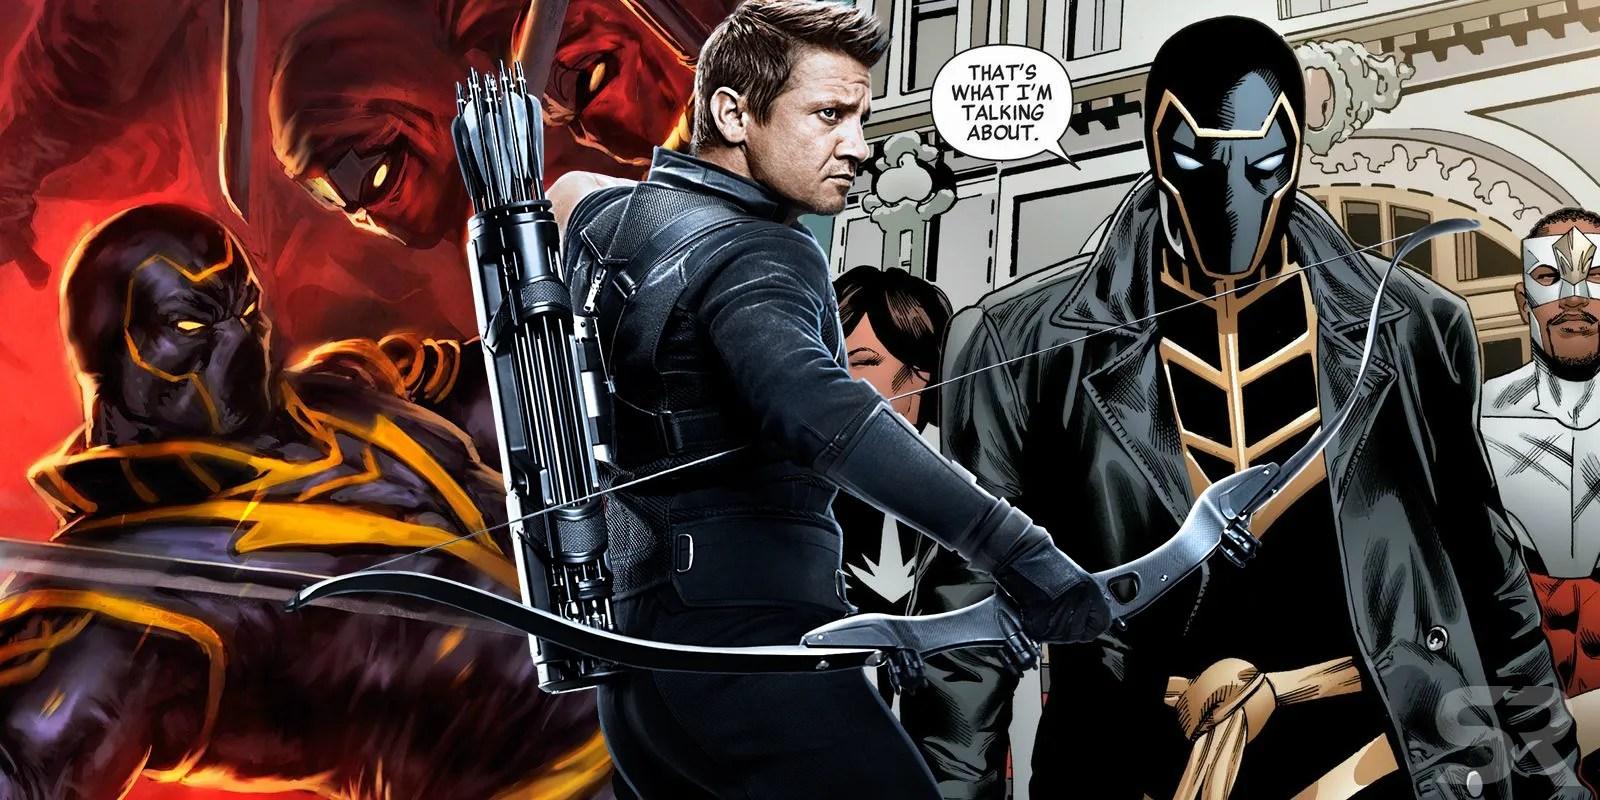 Jeremy Renner Teases Avengers 4 Return as Hawkeye | Screen ...